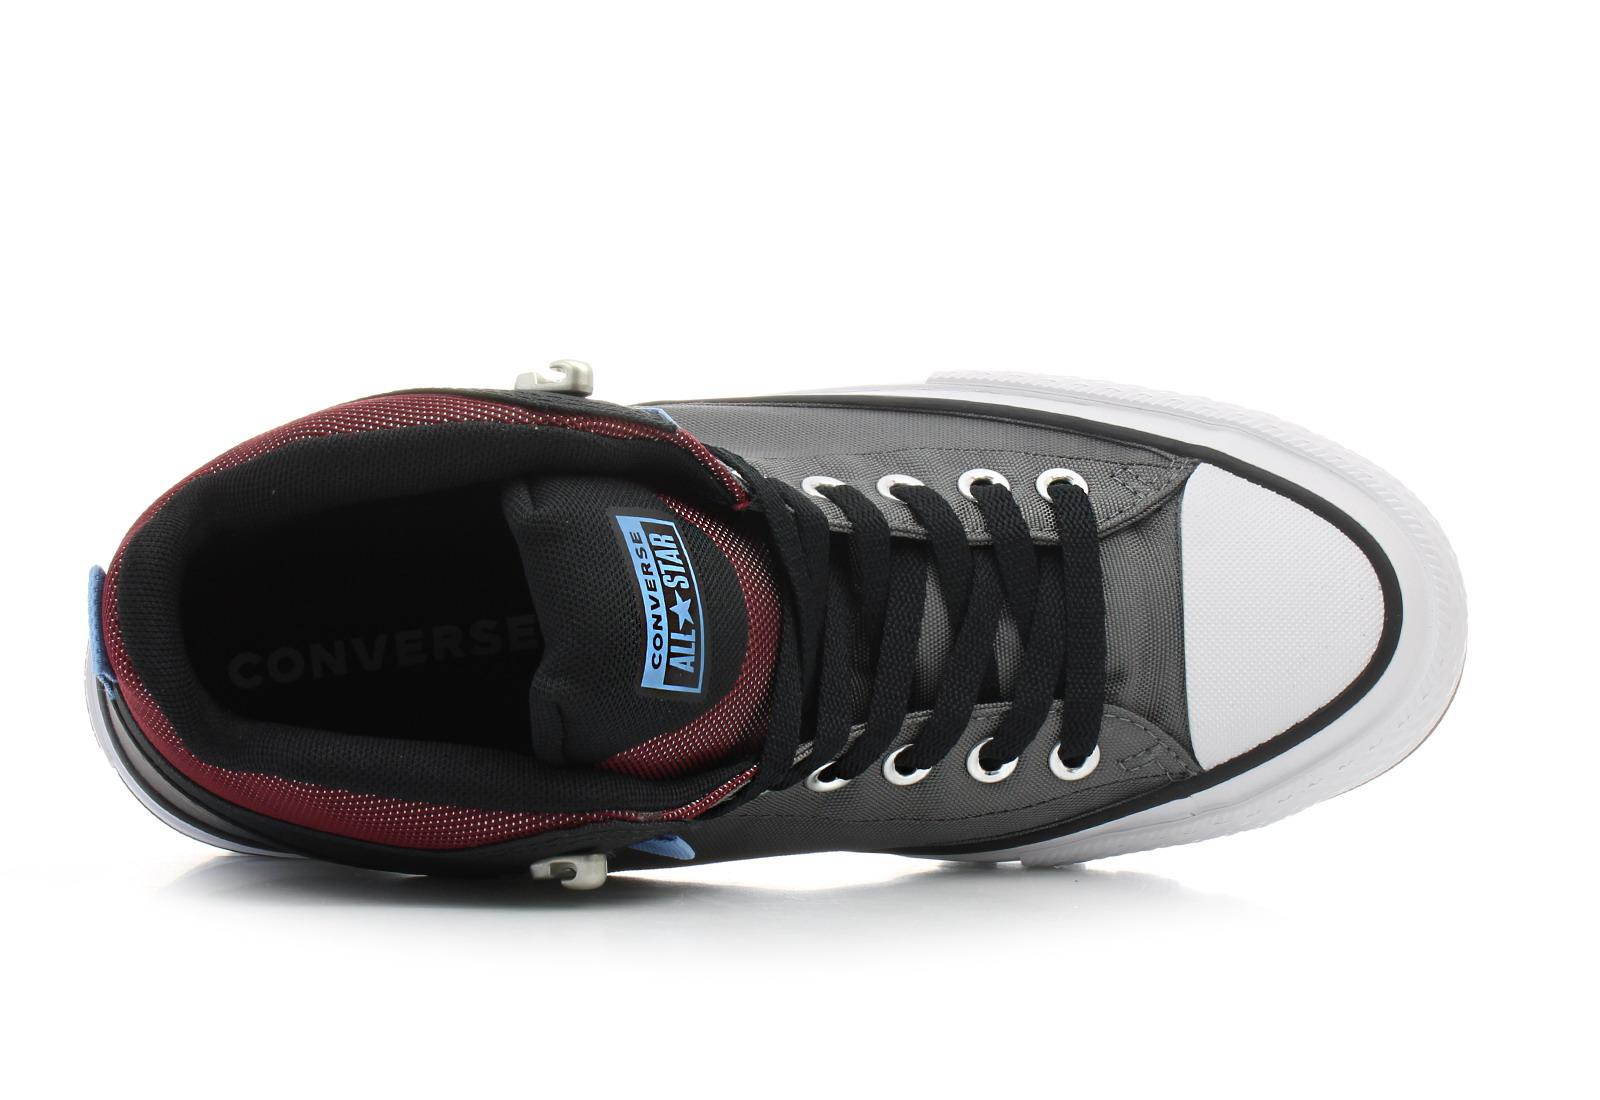 9c881fa8d17c Converse Sneakers - Chuck Taylor All Star Street Boot Hi - 161470C ...